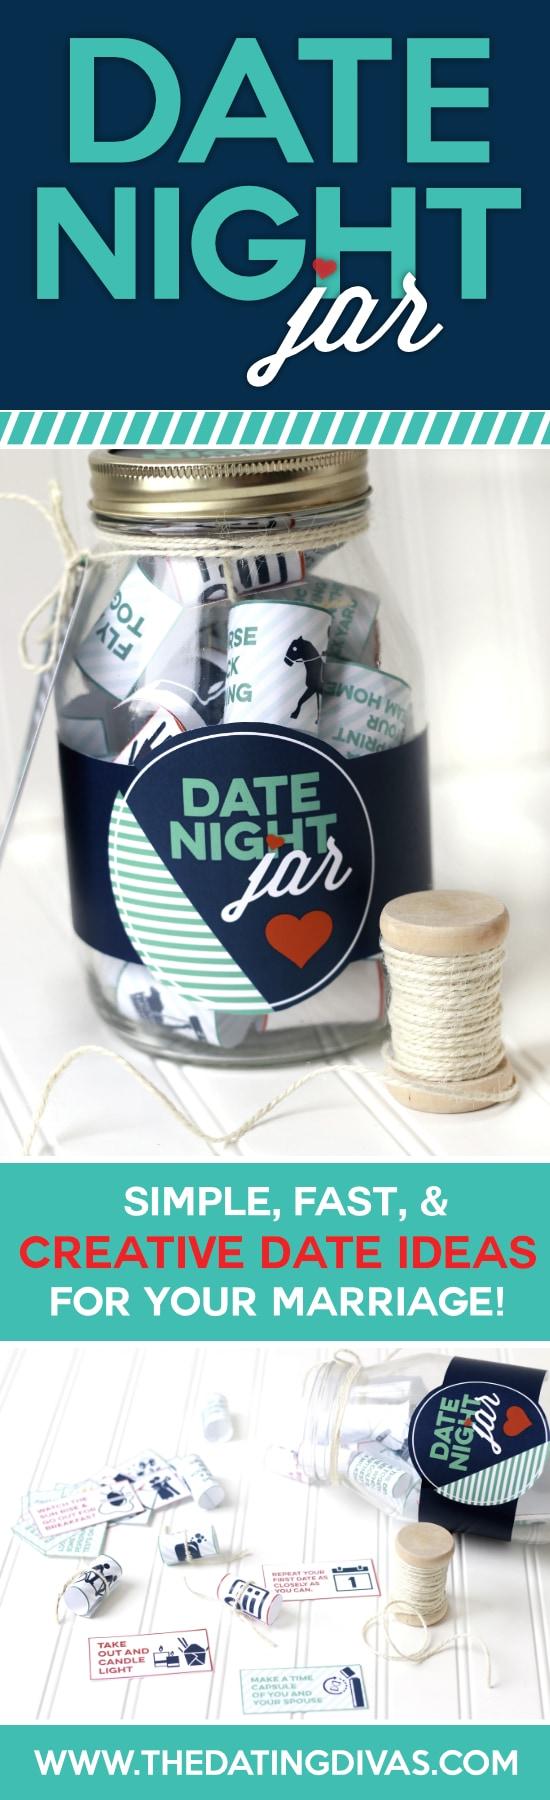 Date Night Jar - The Dating Divas